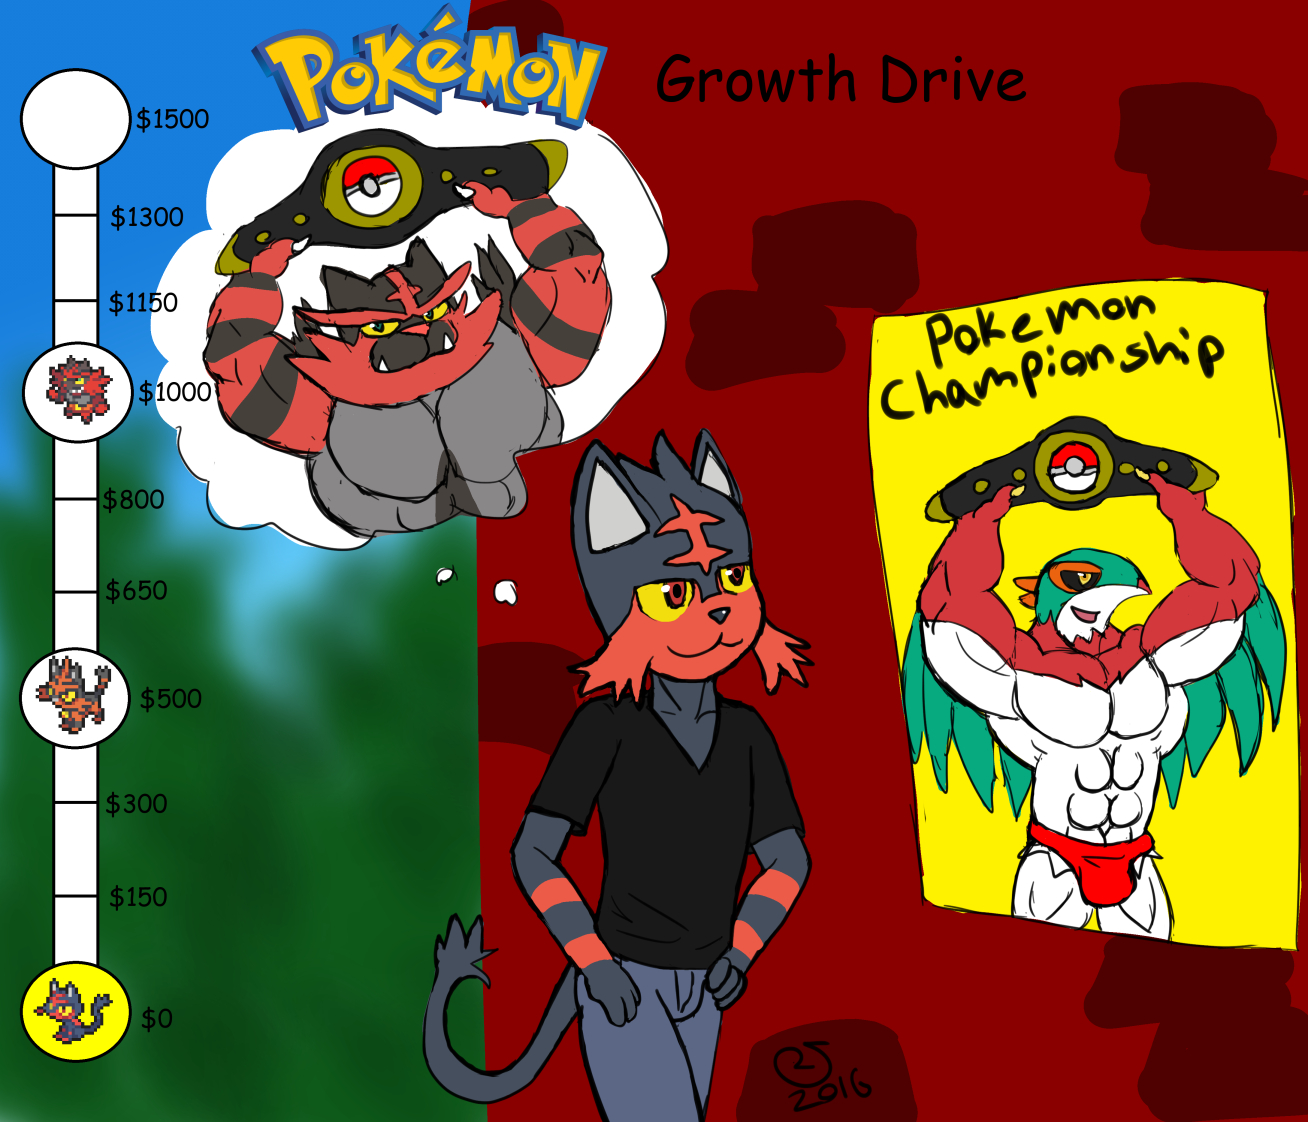 Pokemon Growth Drive: Bilts